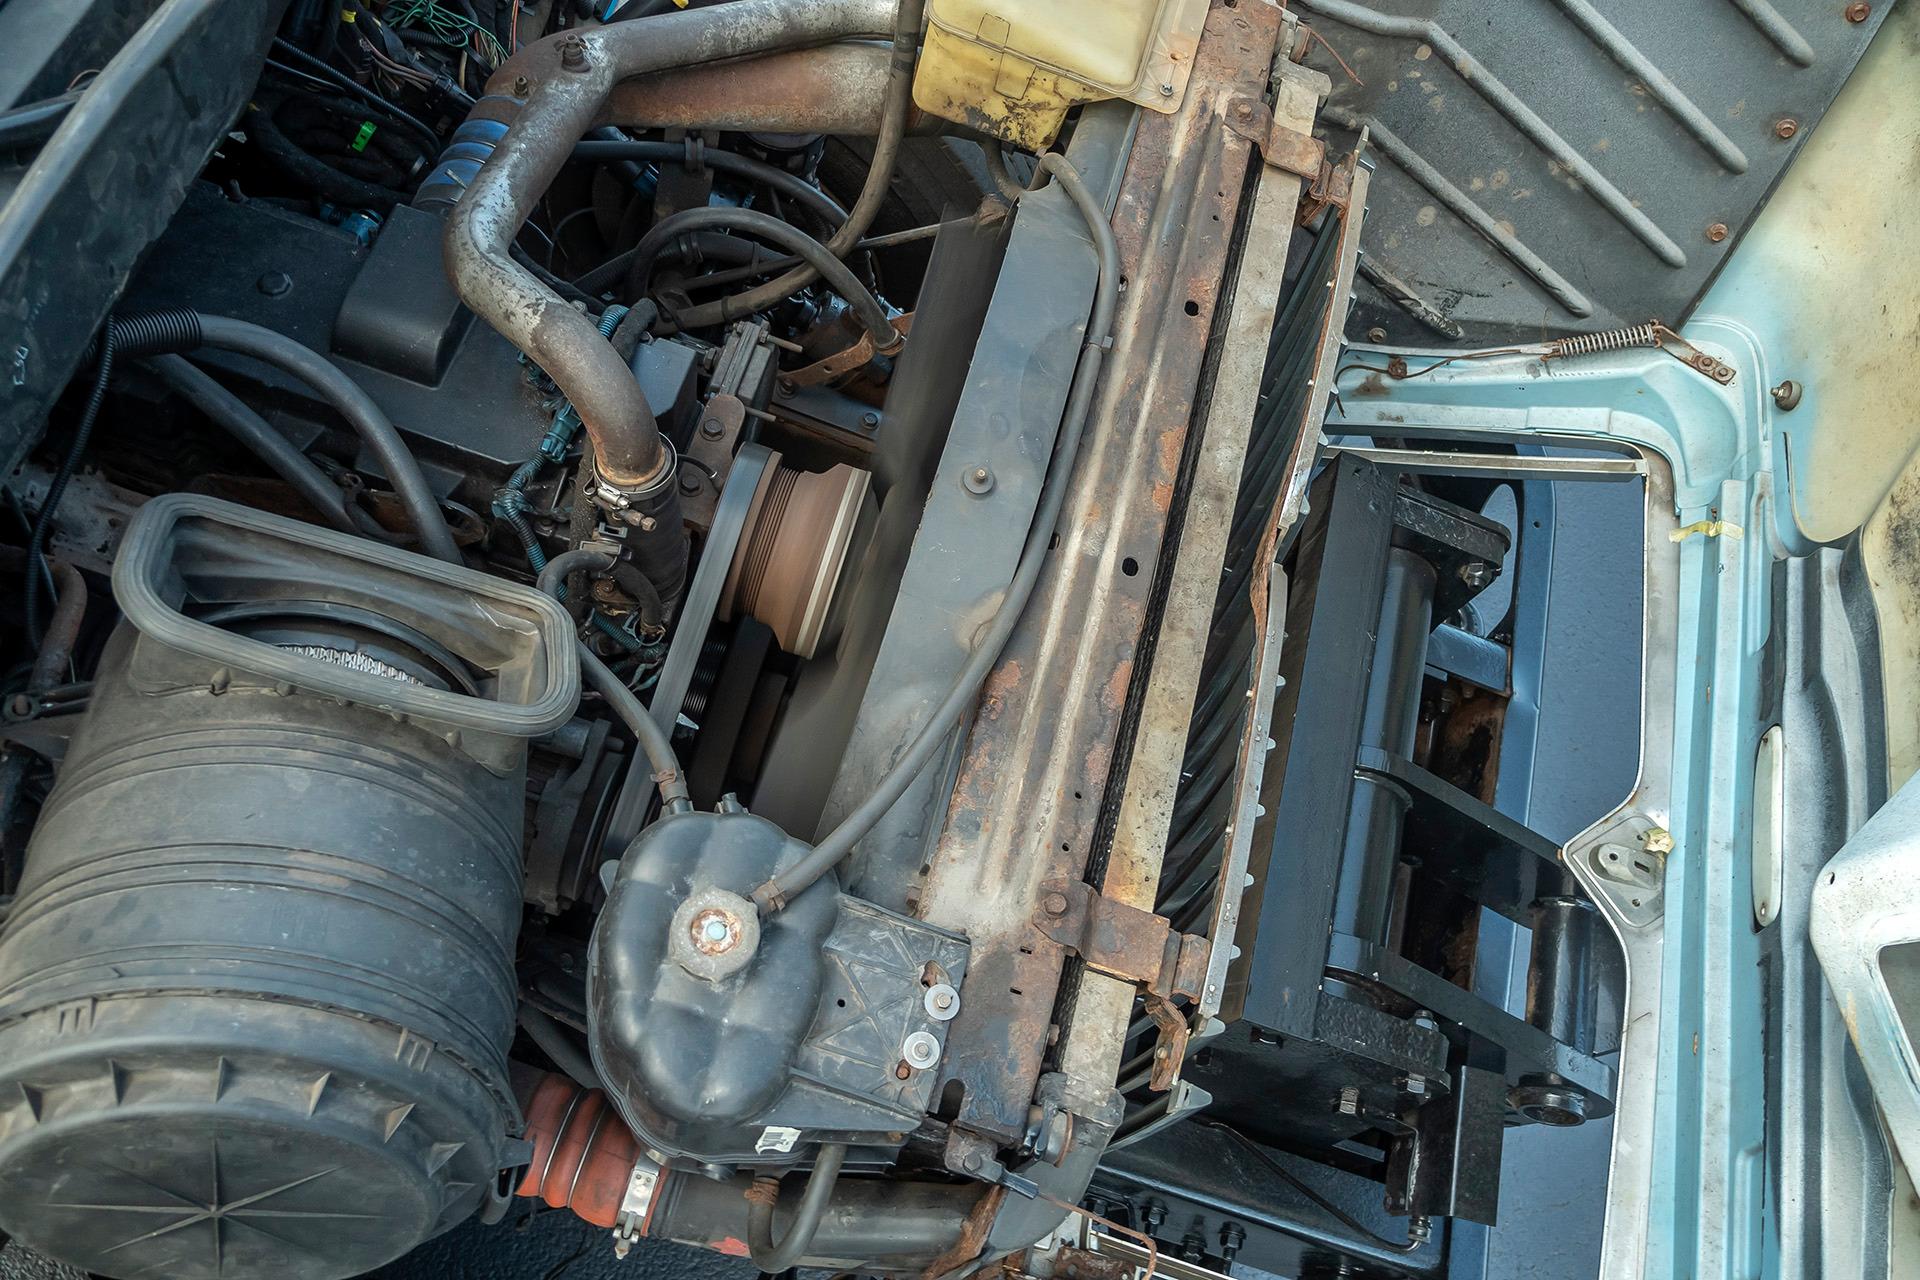 Used-2003-International-7400-Dump-Truck---INFRAME-REBUILD-Over-7K-in-Recent-Service